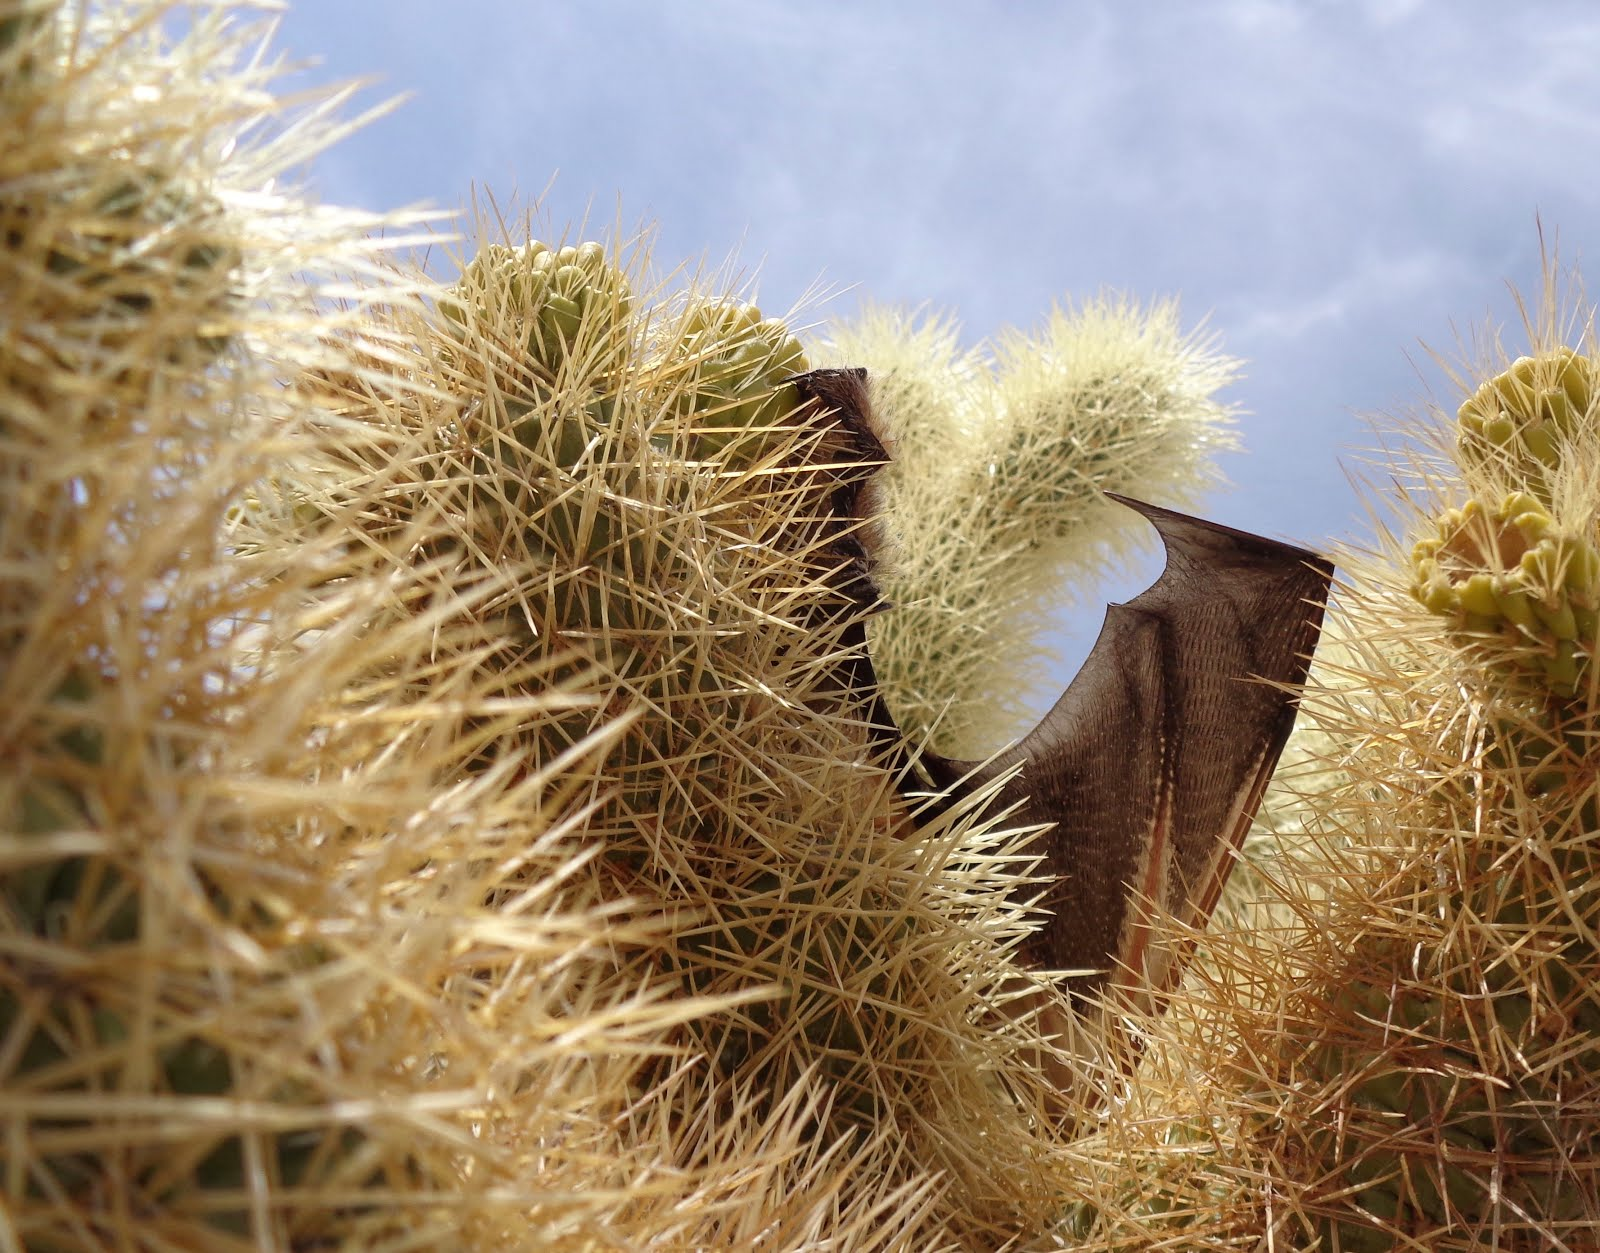 Mojave Desert Scenes